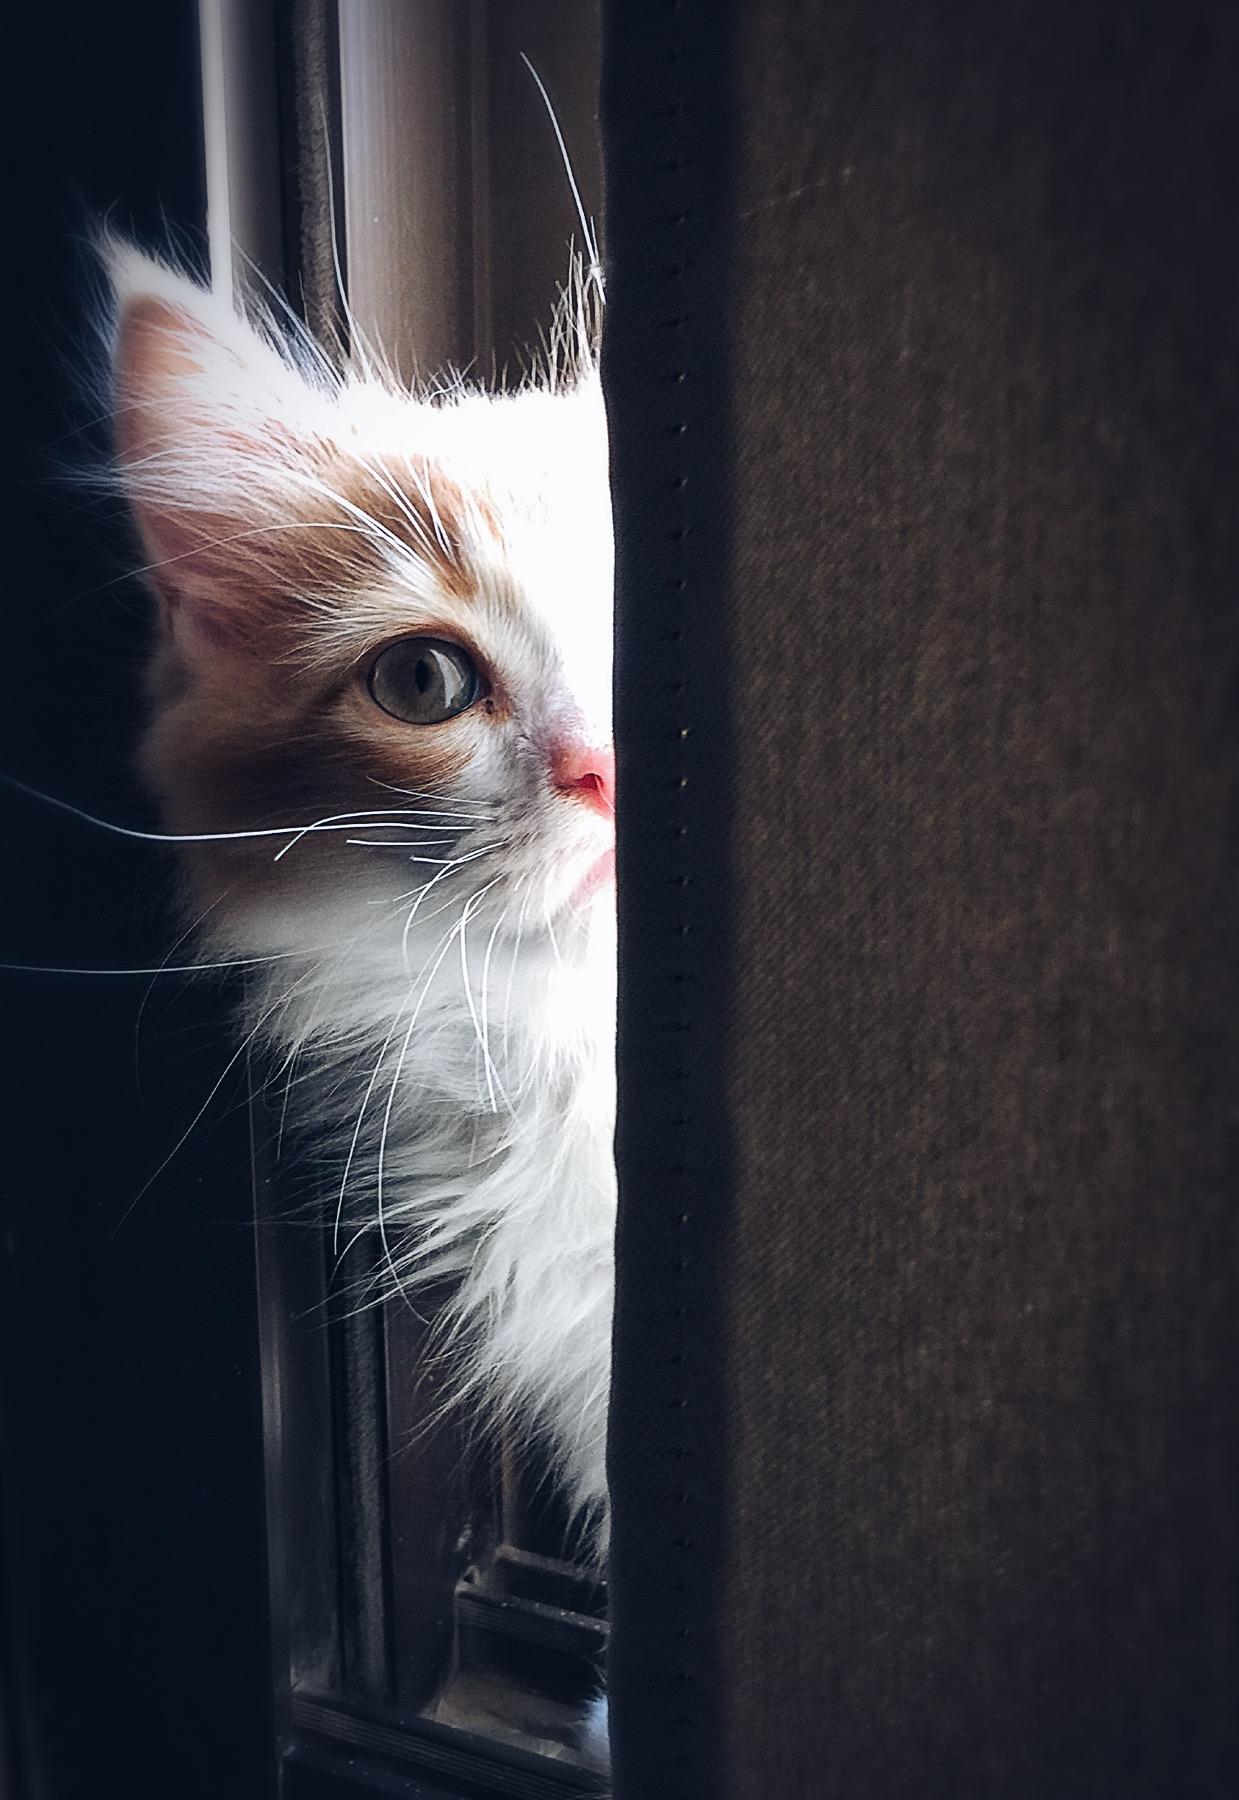 Cute Cartoon Girl Hd Wallpapers Close Up Of Cat 183 Free Stock Photo